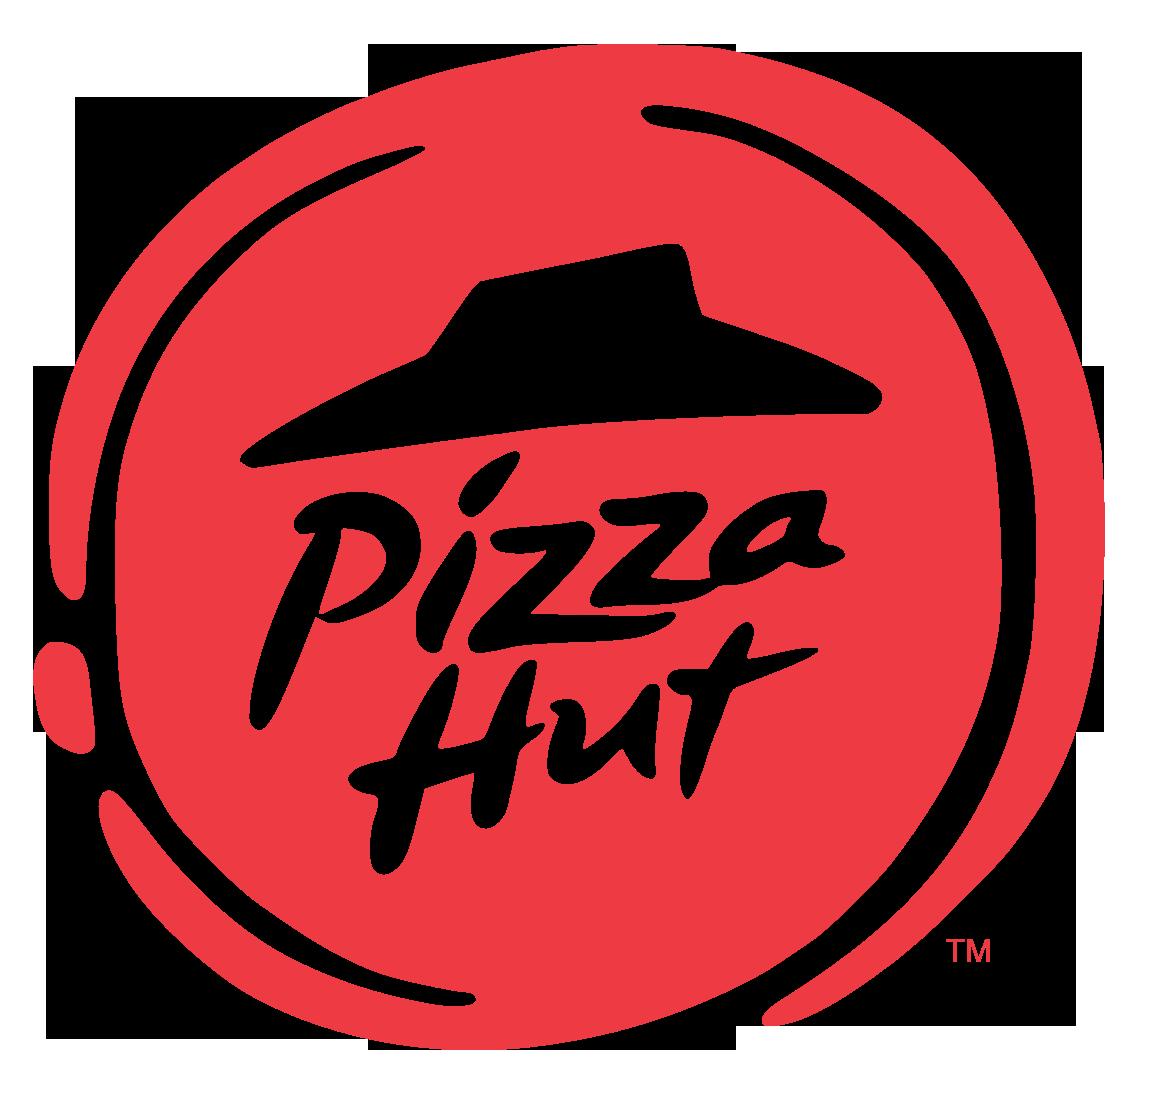 Pizza Hut Royale Cup